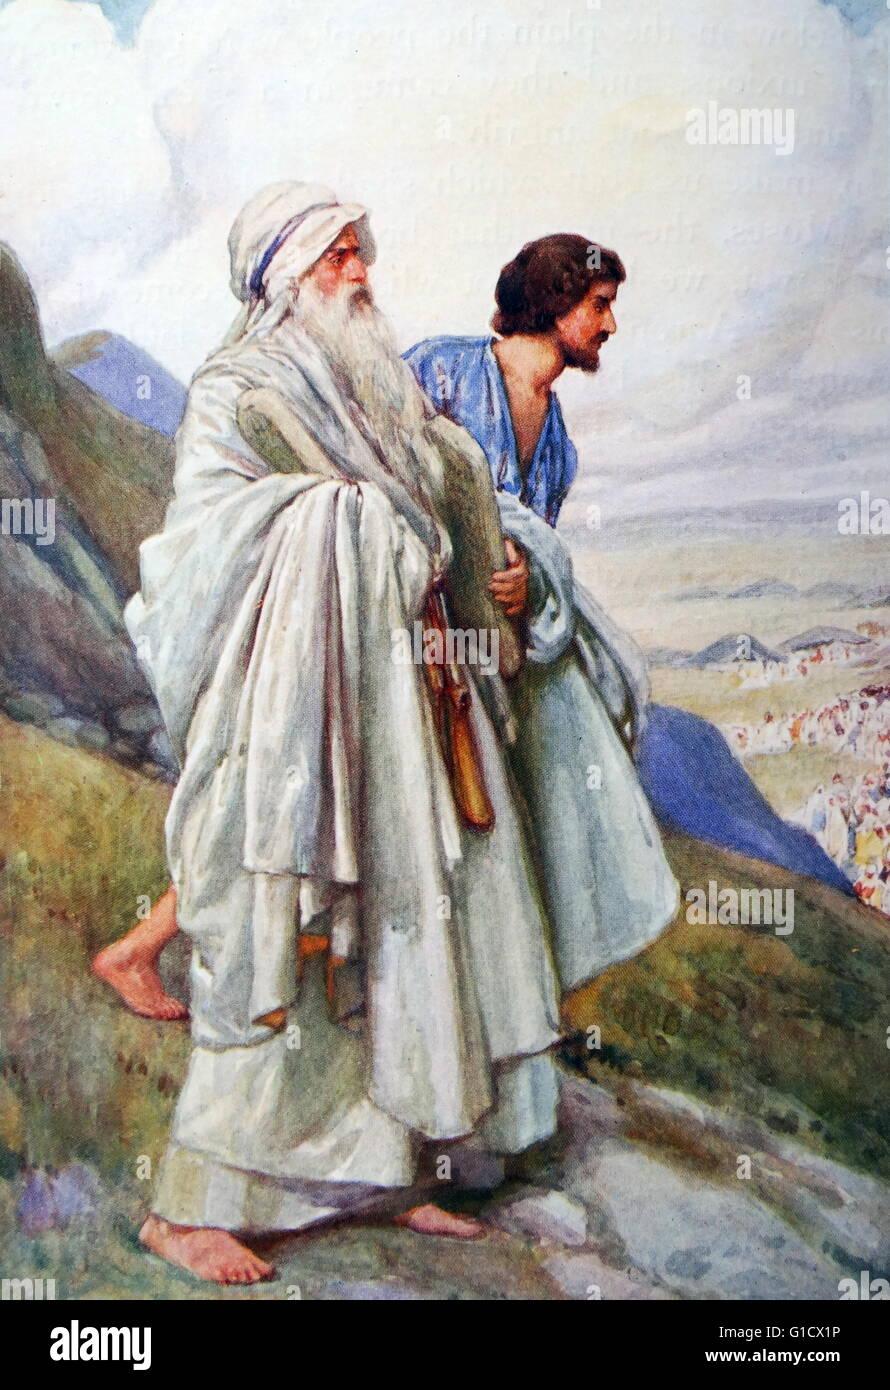 Moses Joshua Stock Photos & Moses Joshua Stock Images - Alamy